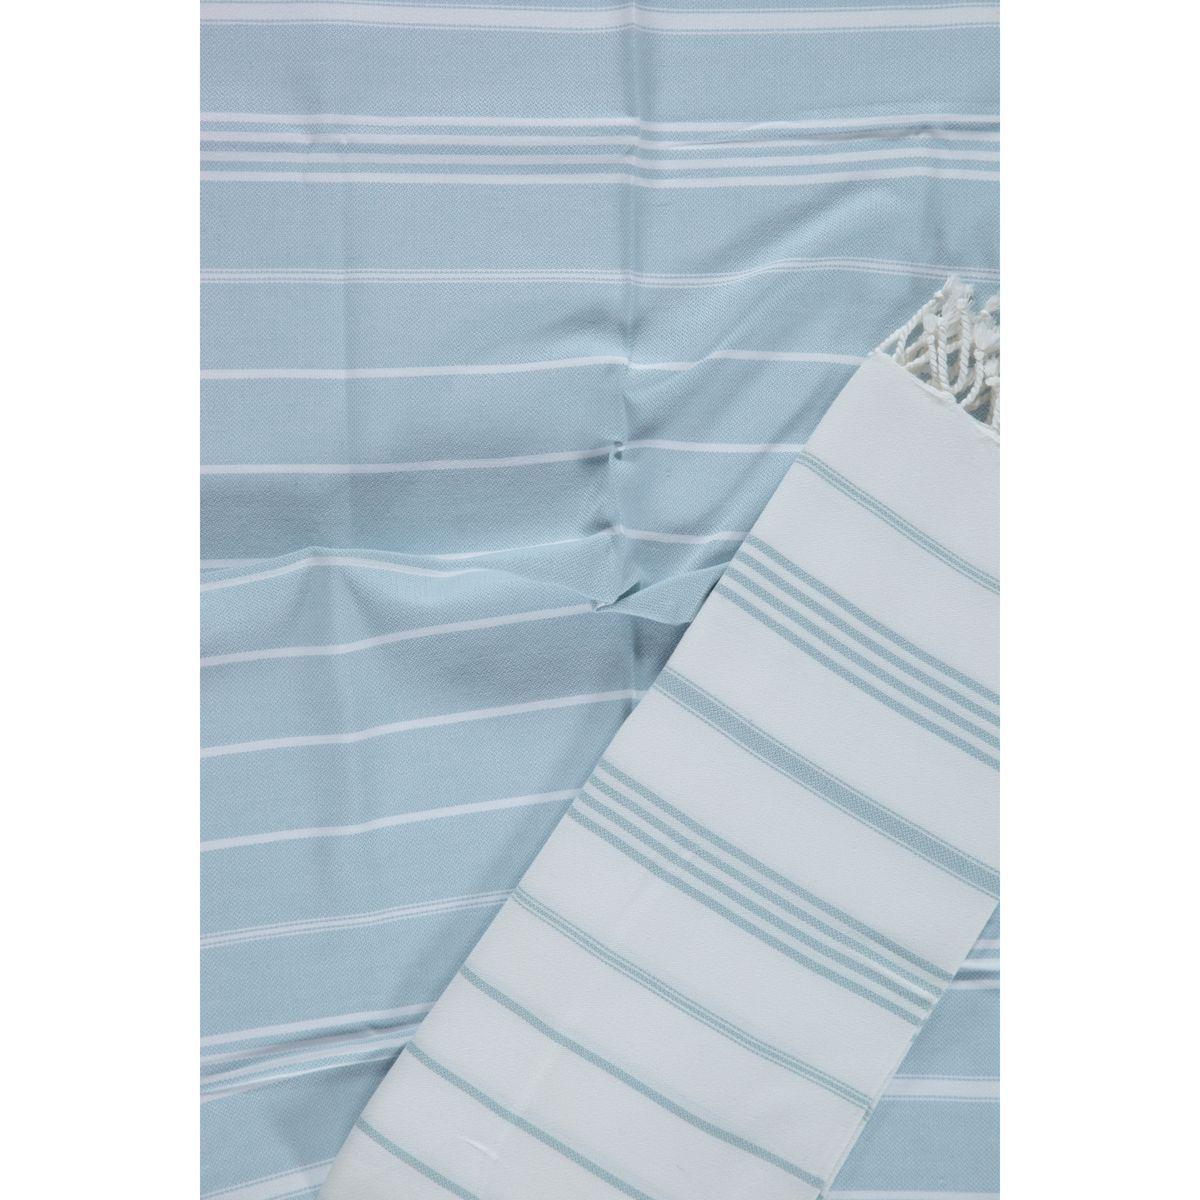 Peshkir Leyla / Light Blue stripes